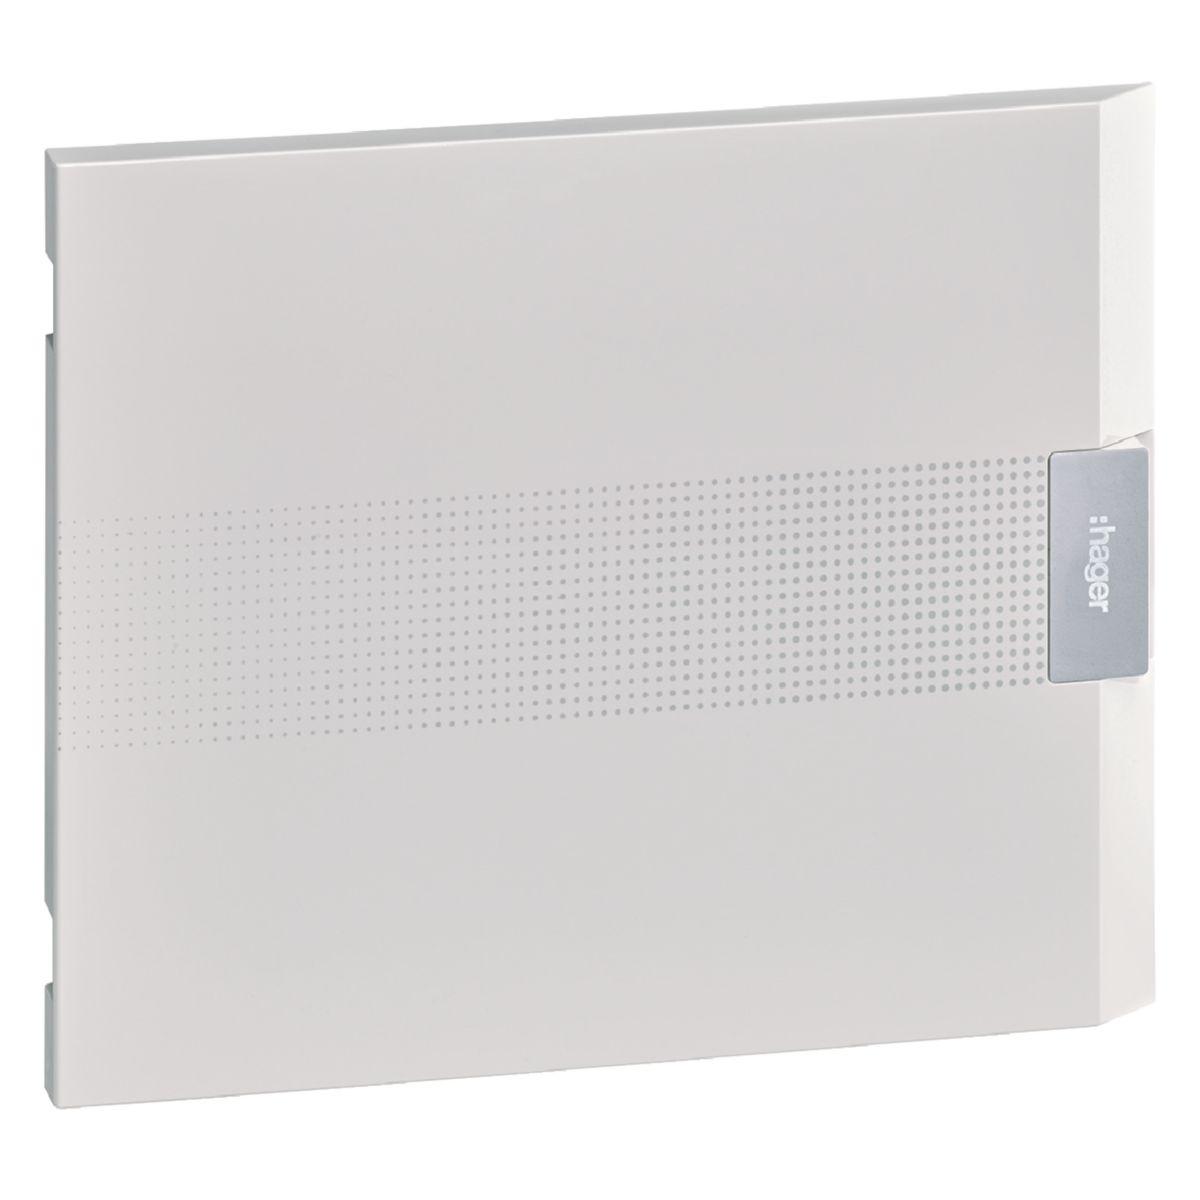 Porte opaque vega 18 modules 1R Réf. VZ118P